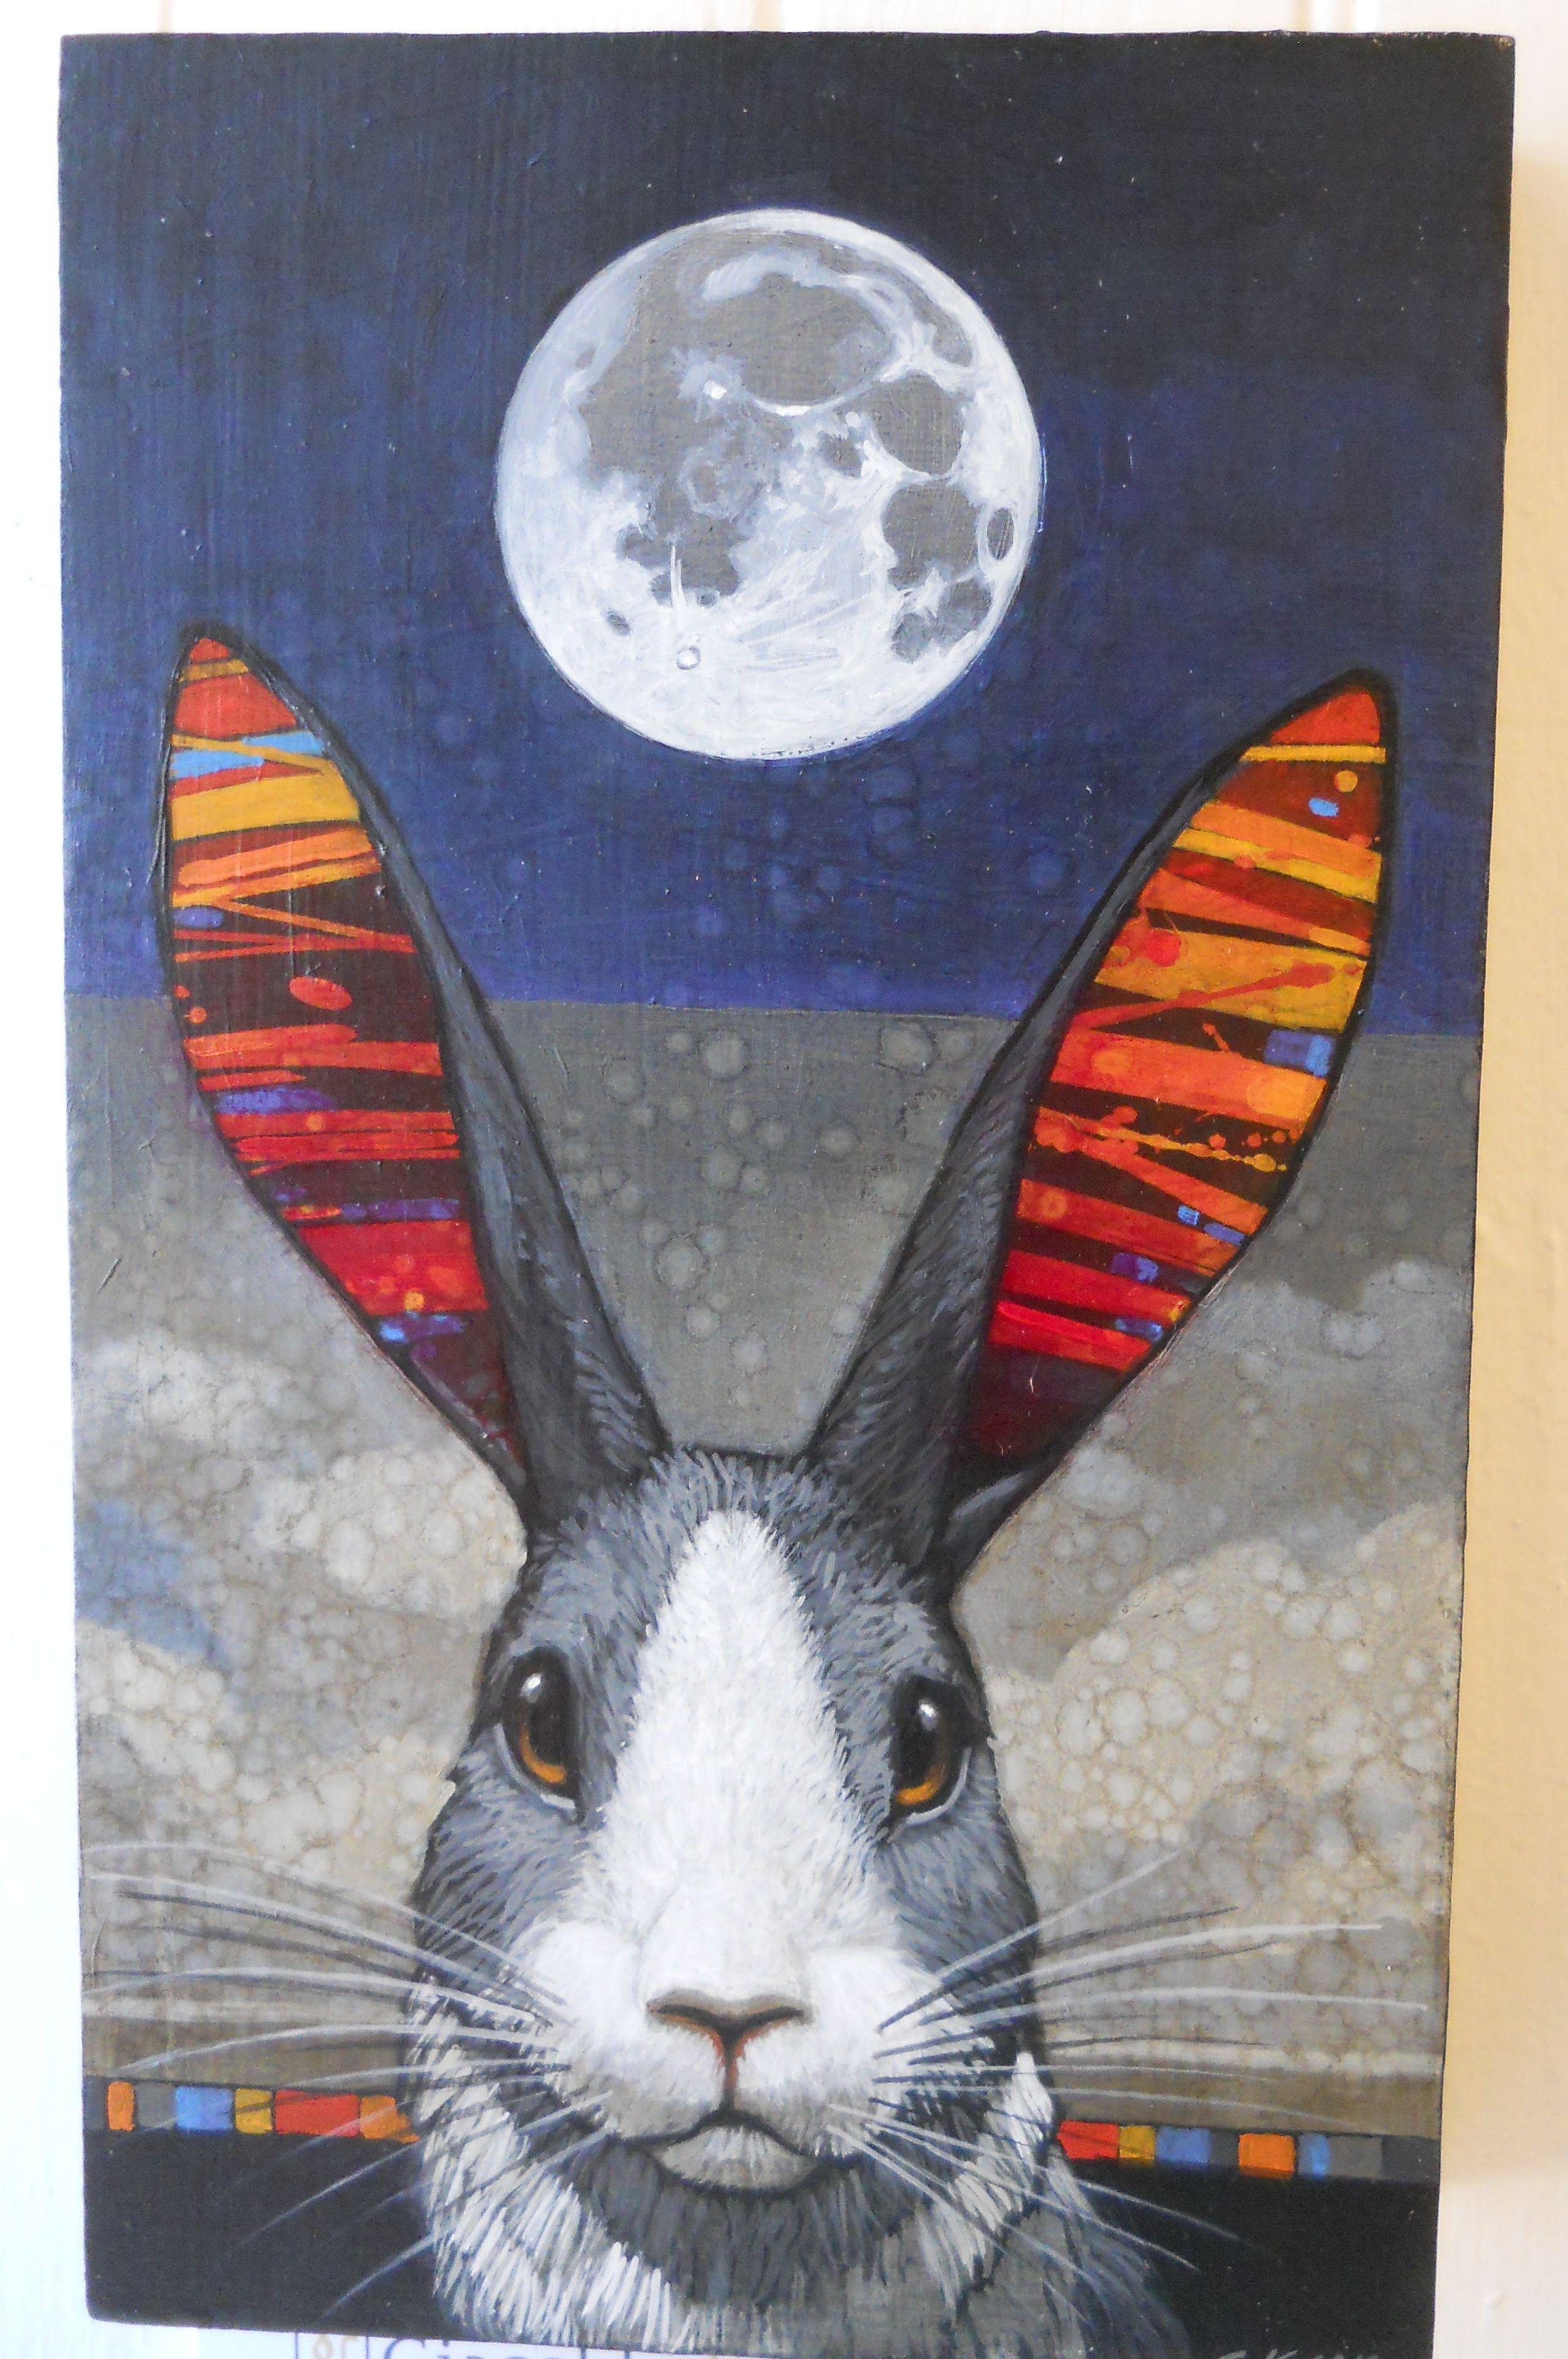 Artist Craig Kosak. Santa Fe, New Mexico.